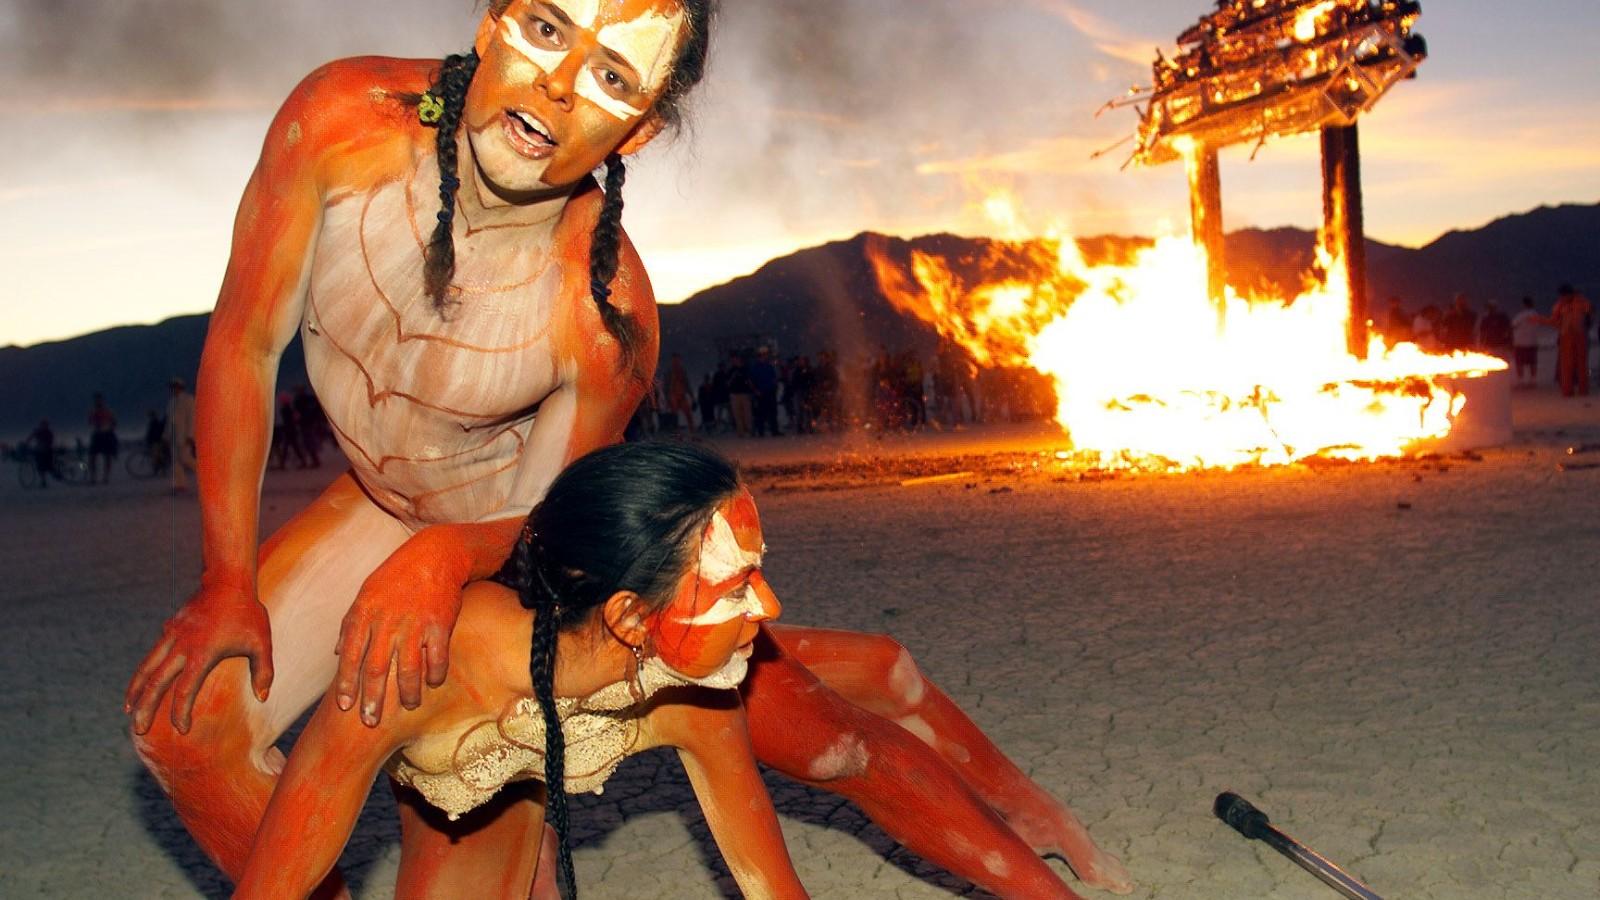 Man nude spanking burning